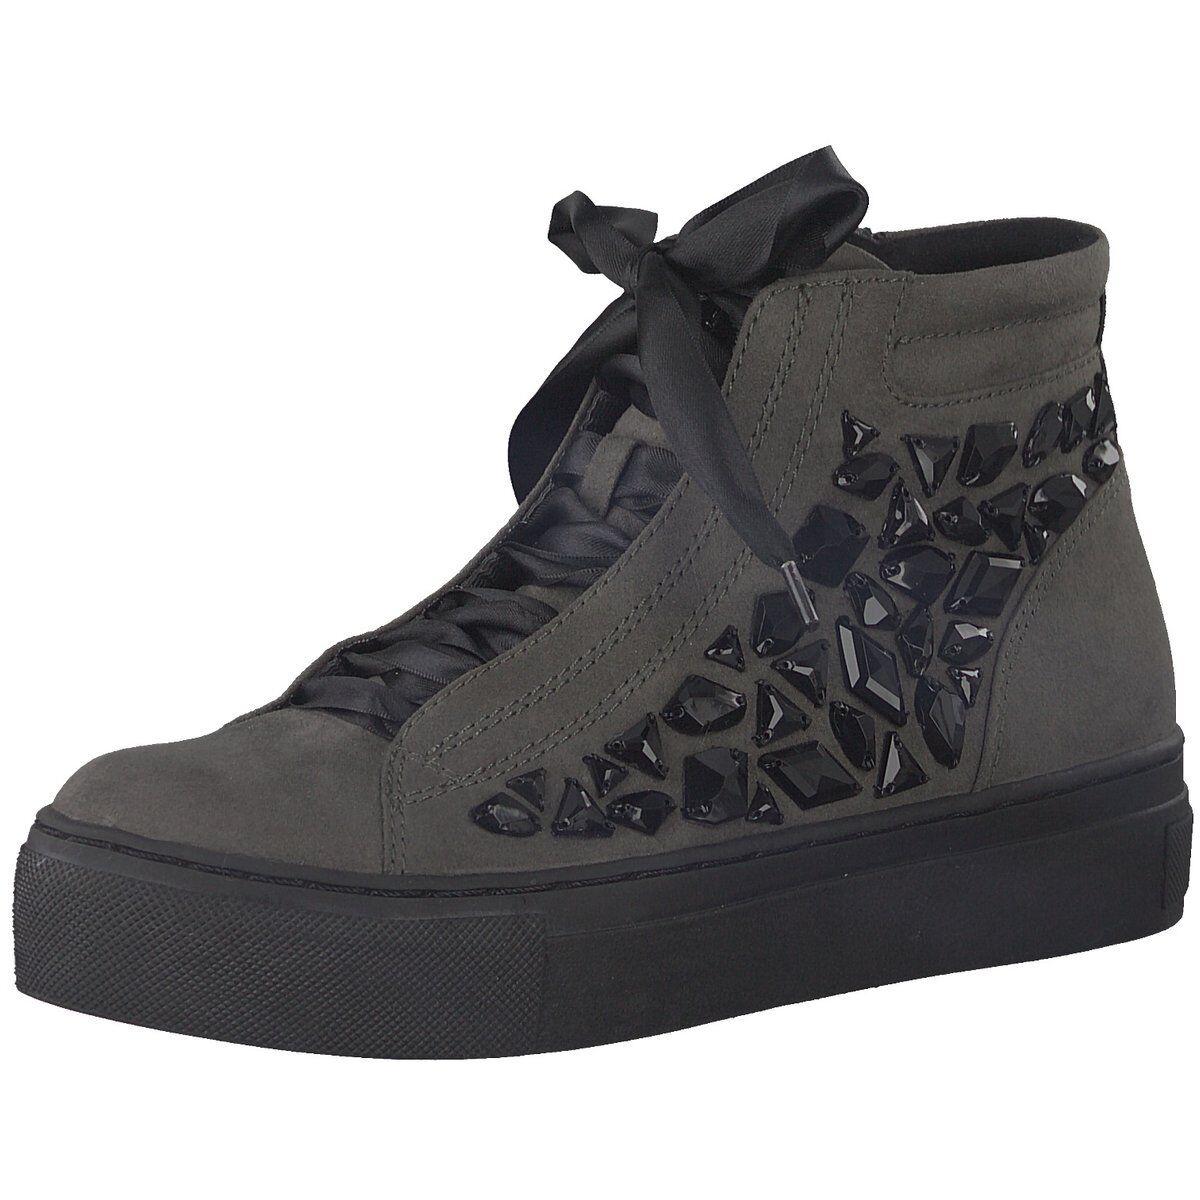 NEU Marco Tozzi Damen Stiefeletten Woms Boots 2-2-25257-21/225 225 grau 523659